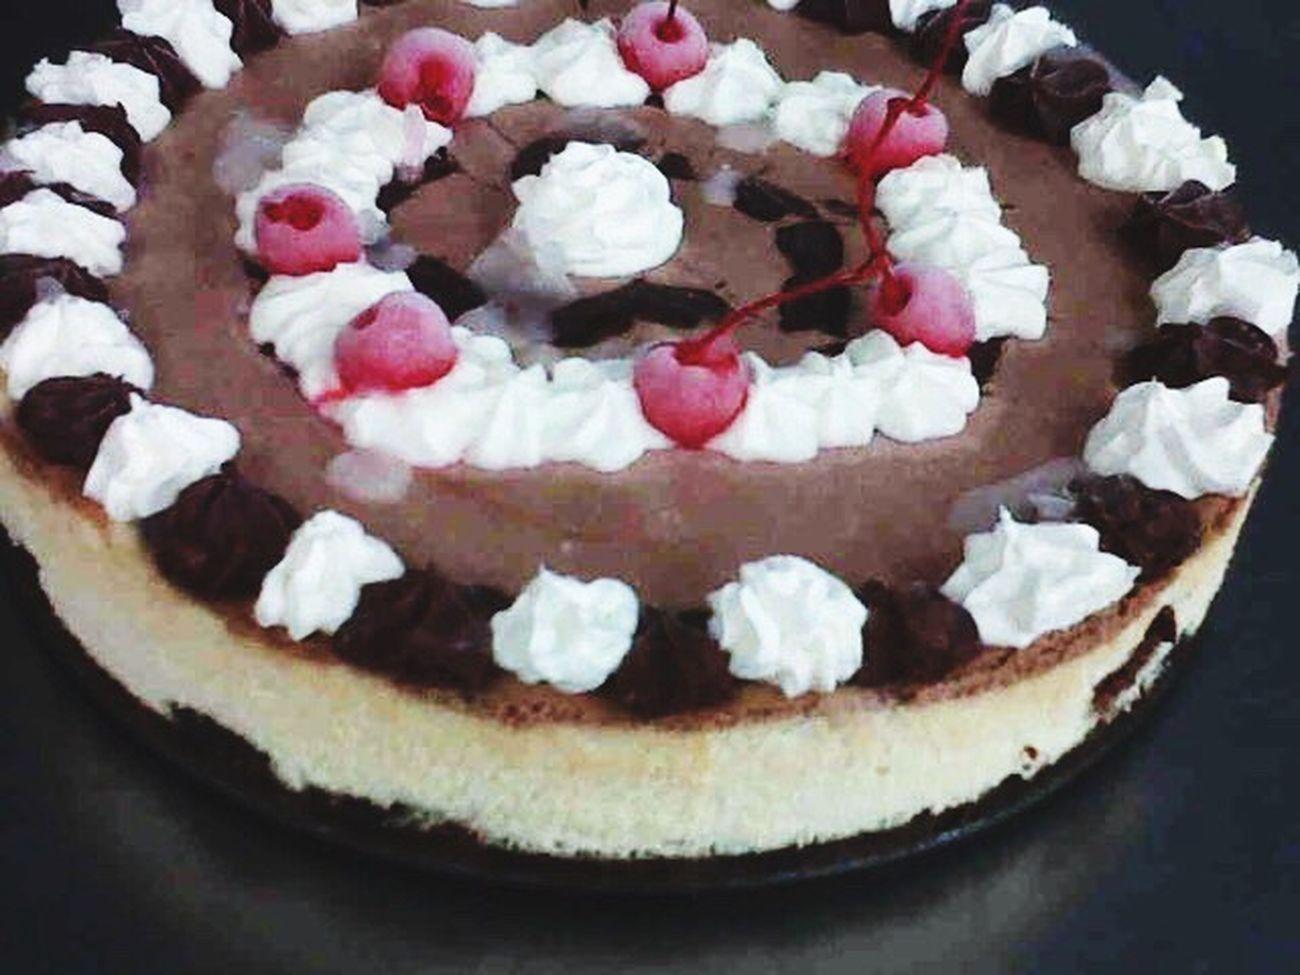 Mypastrycreations Cheesecake♥ Chocolatelover Something Edible Food Frozen Cheesecake Choca-mocha Brownie